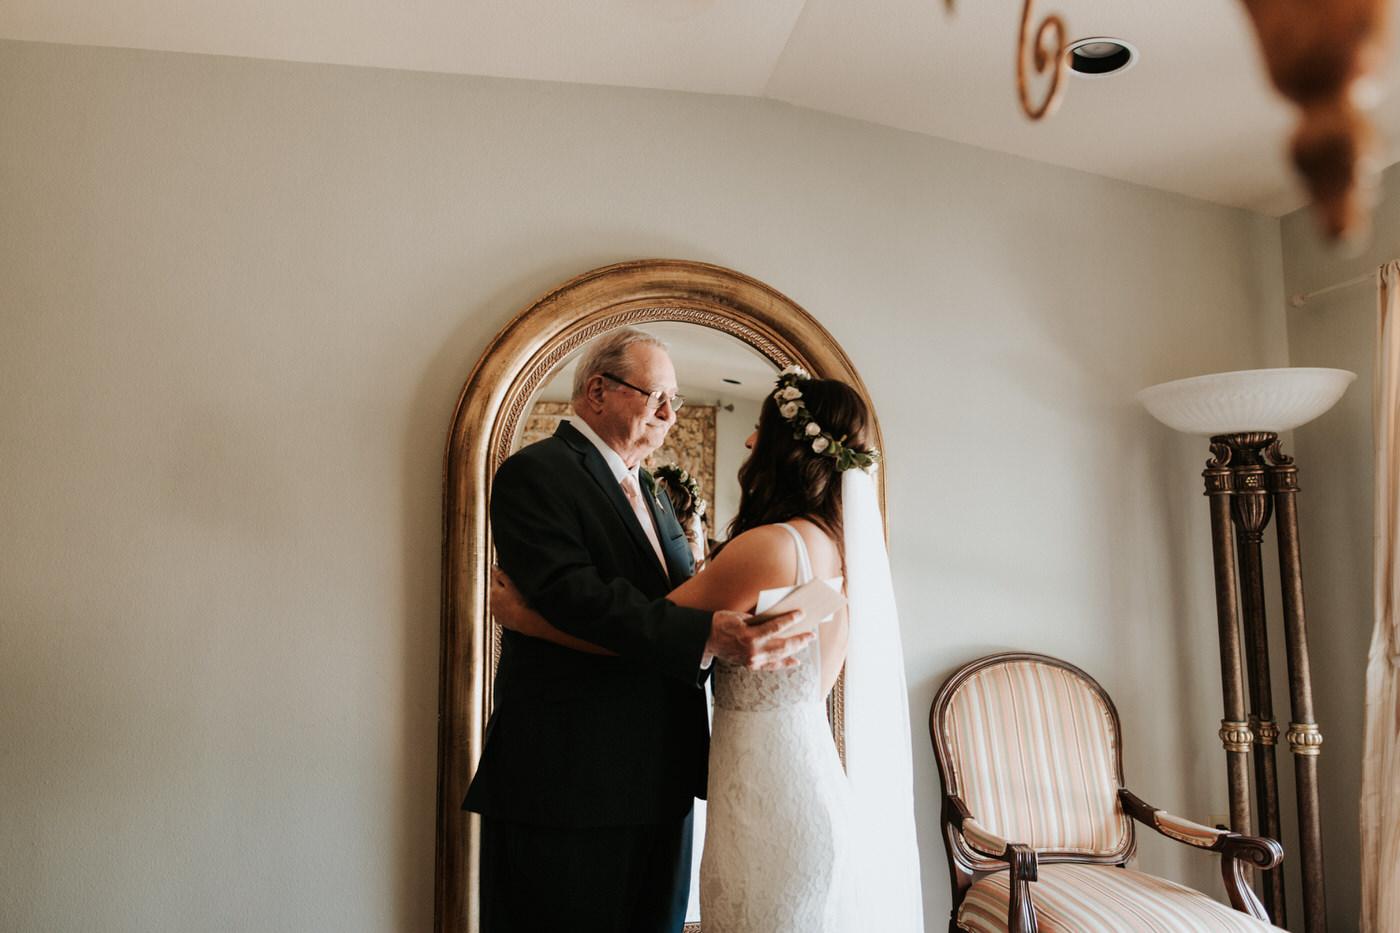 Thurman Mansion Wedding - Diana Ascarrrunz Photography -229.jpg